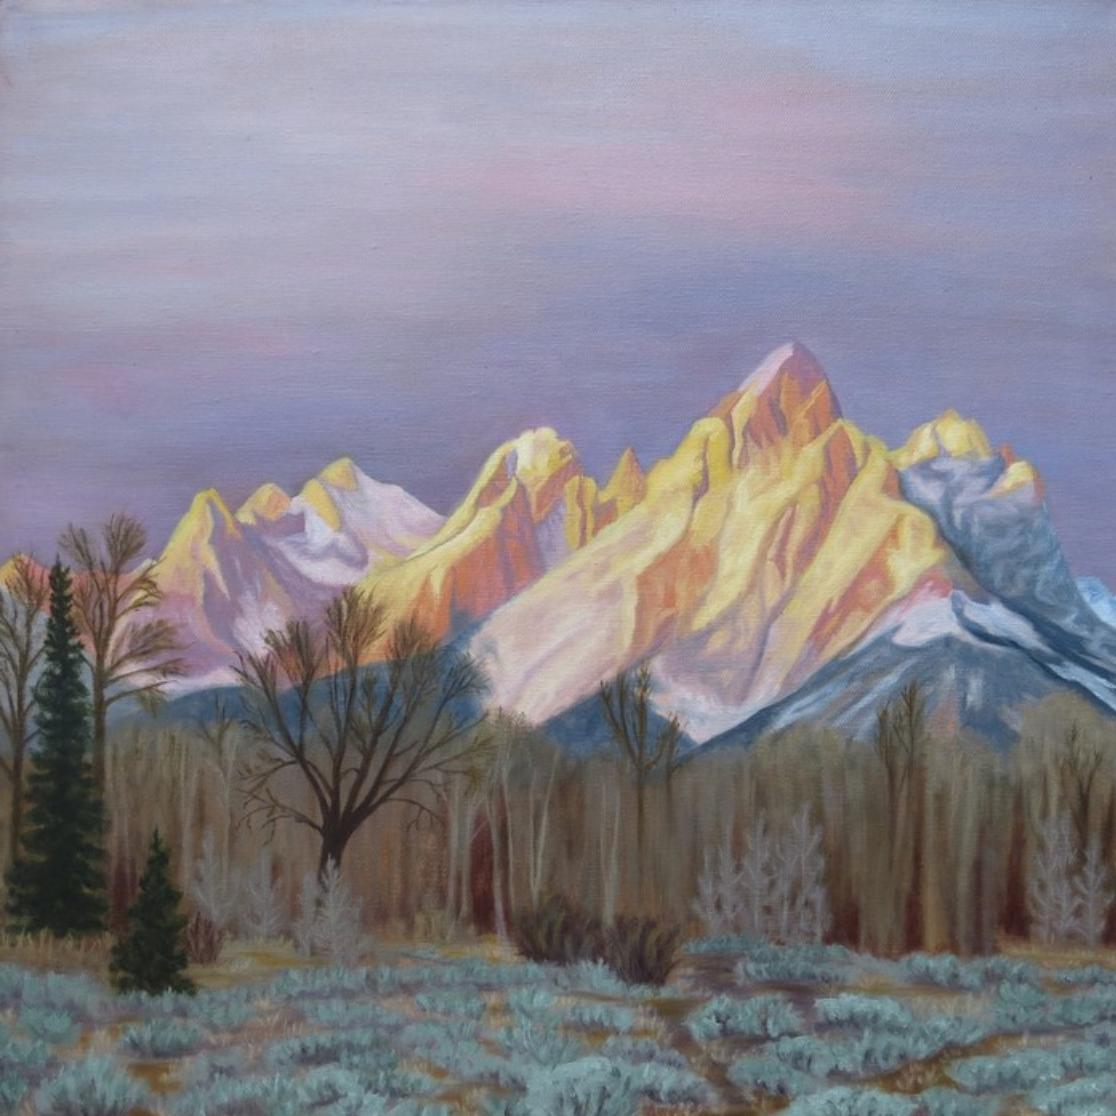 Laurie LaMere - A Grand Dawn